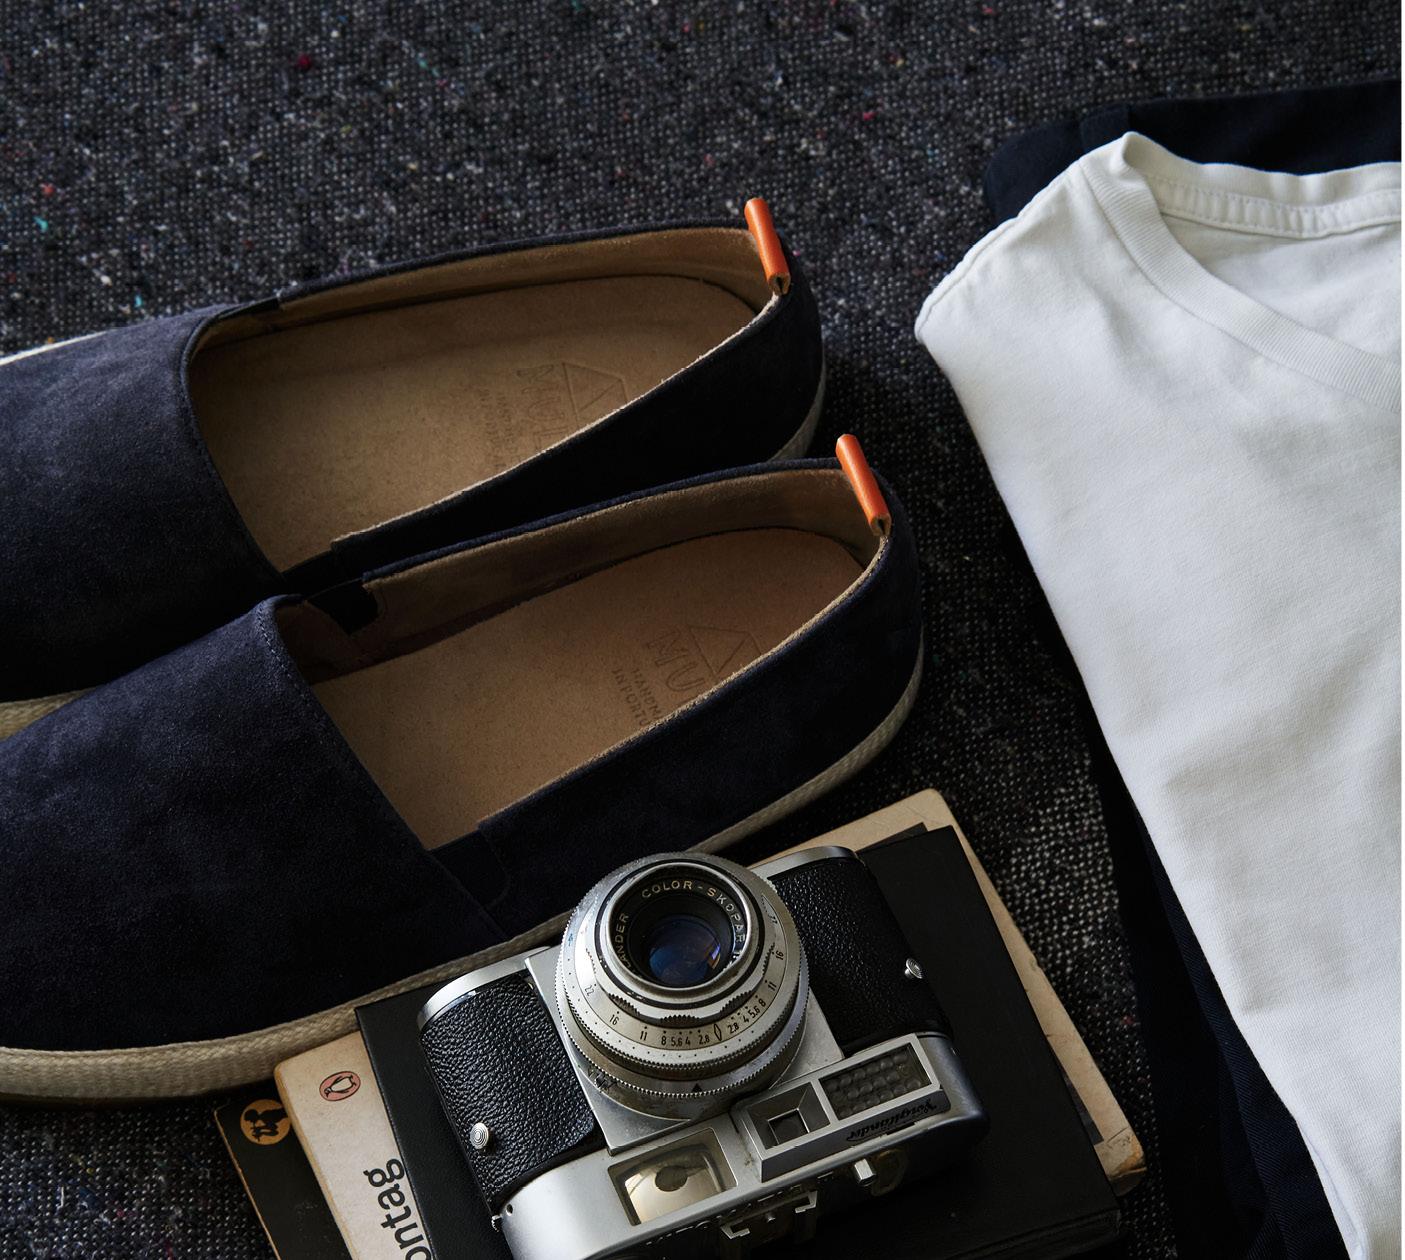 Mens Summer Shoes - Suede Espadrilles